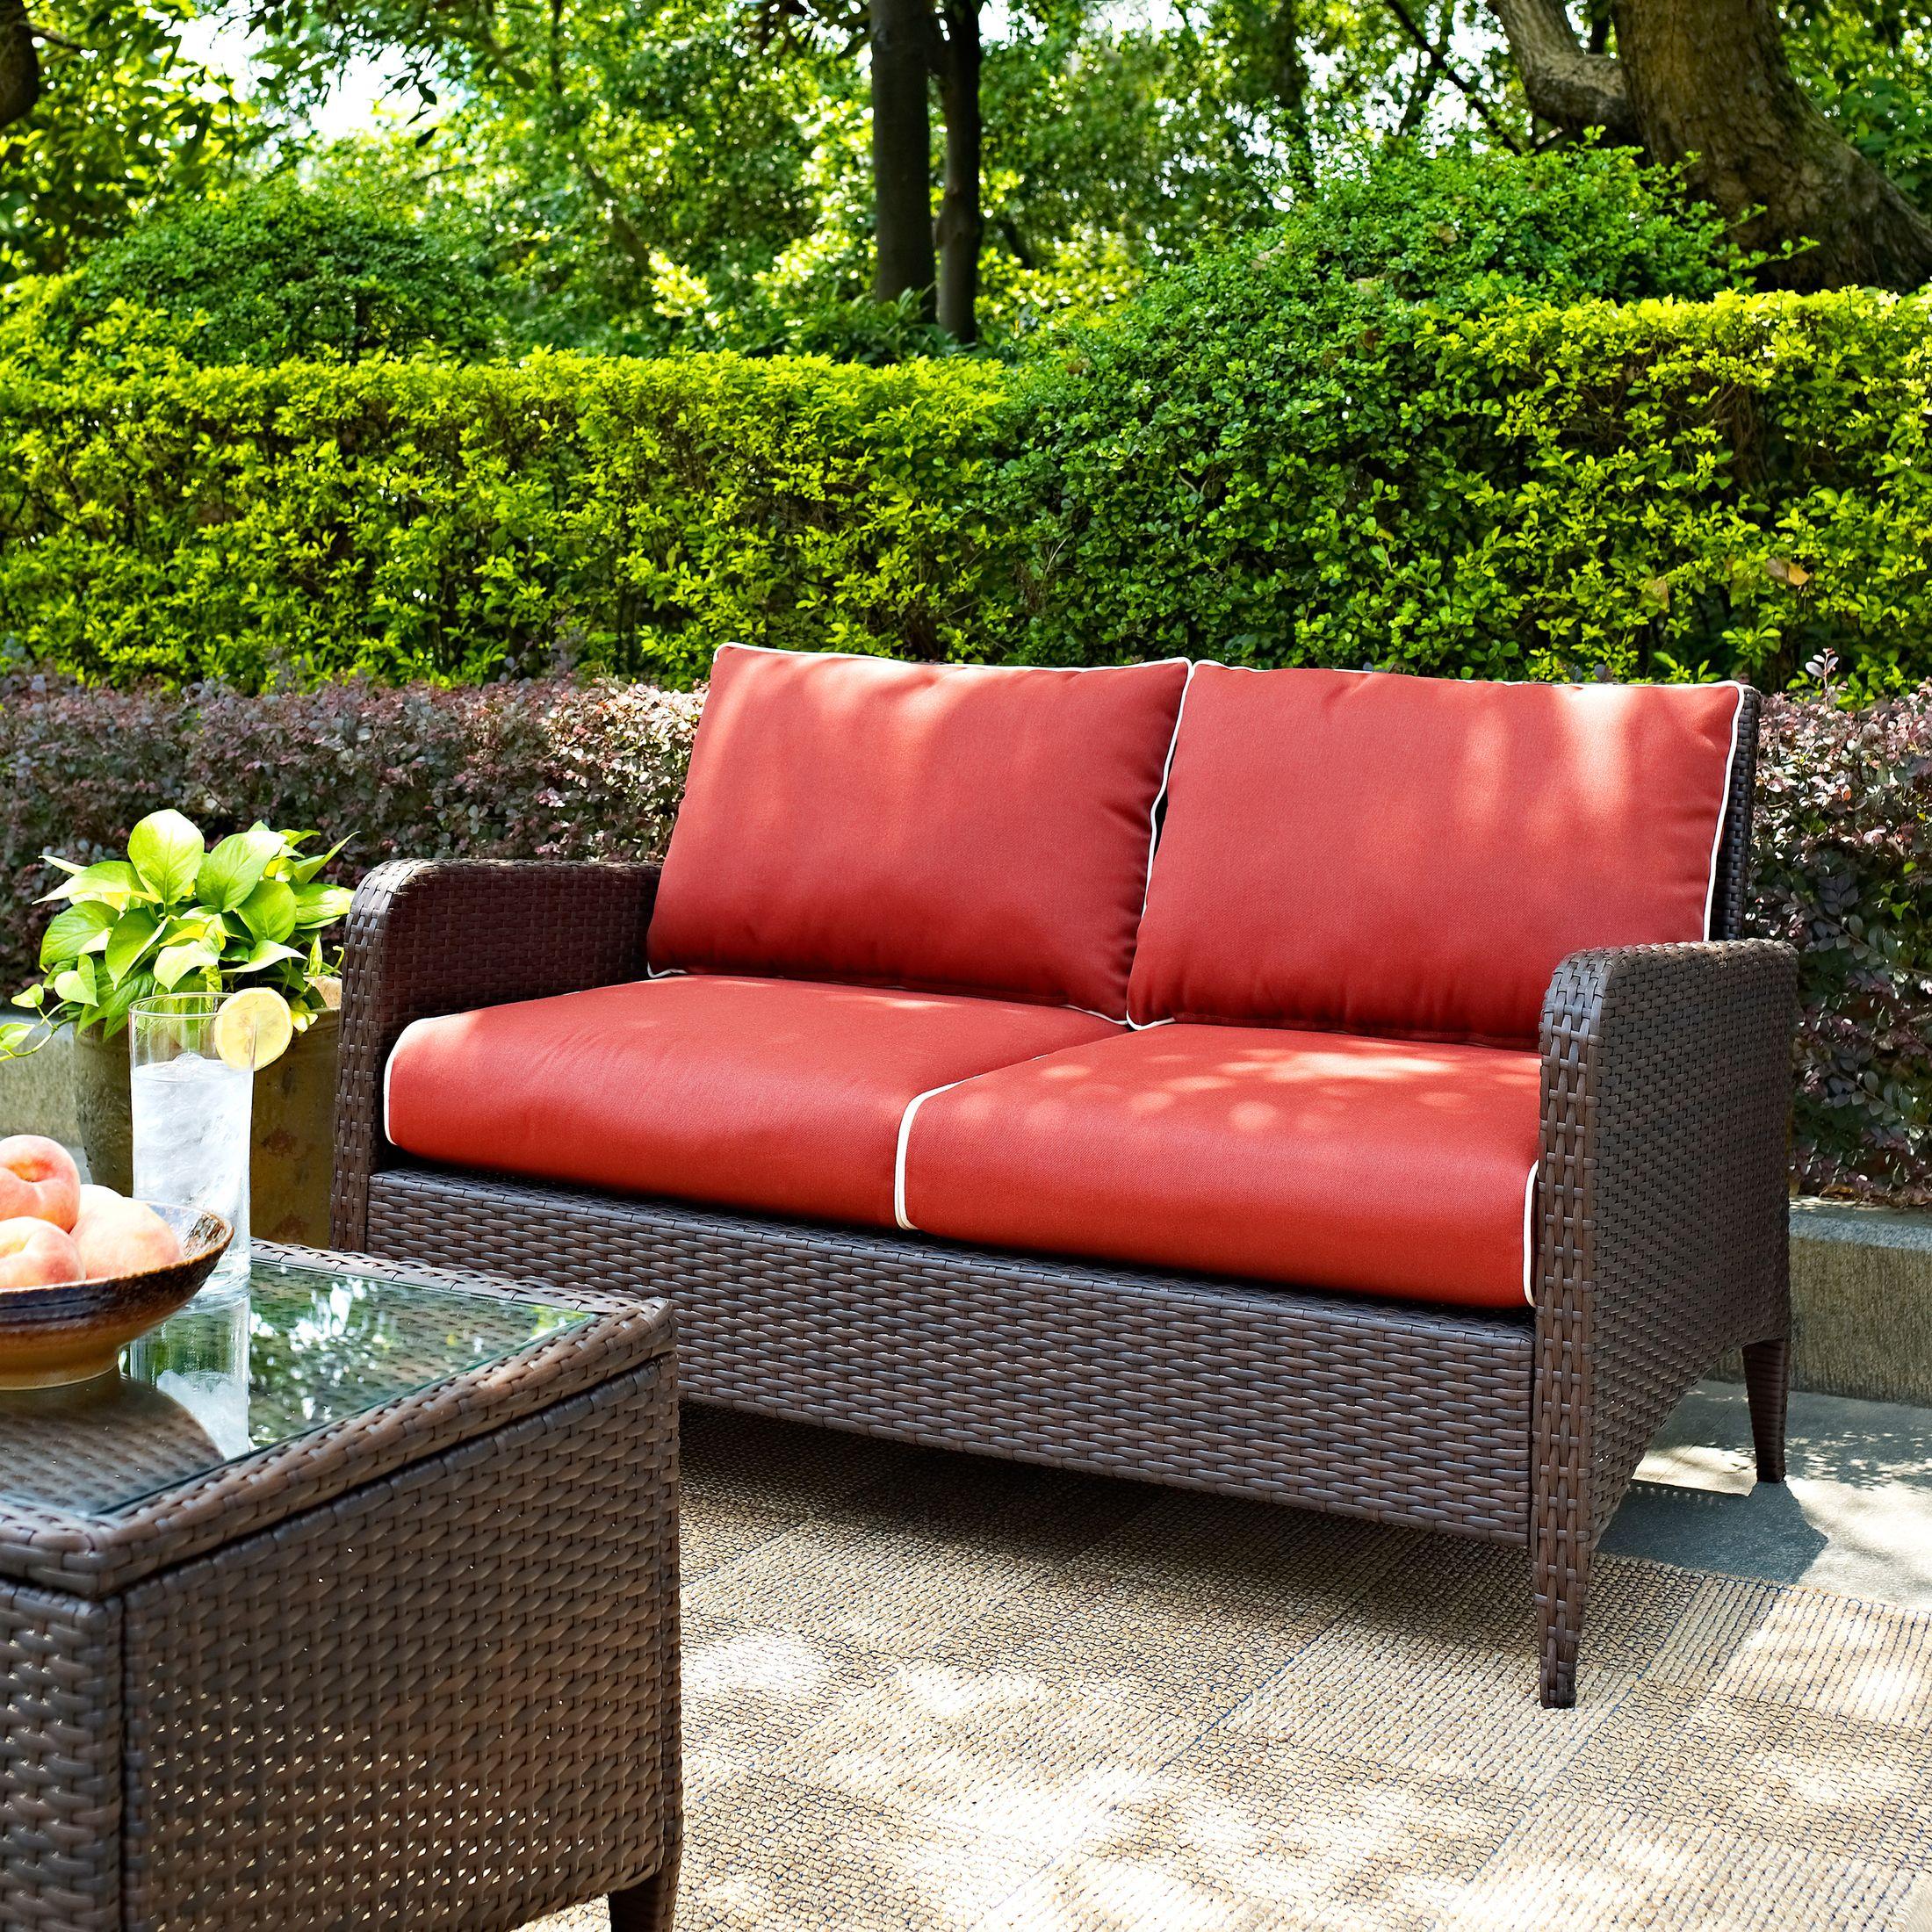 Outdoor Furniture - Corona Outdoor Loveseat